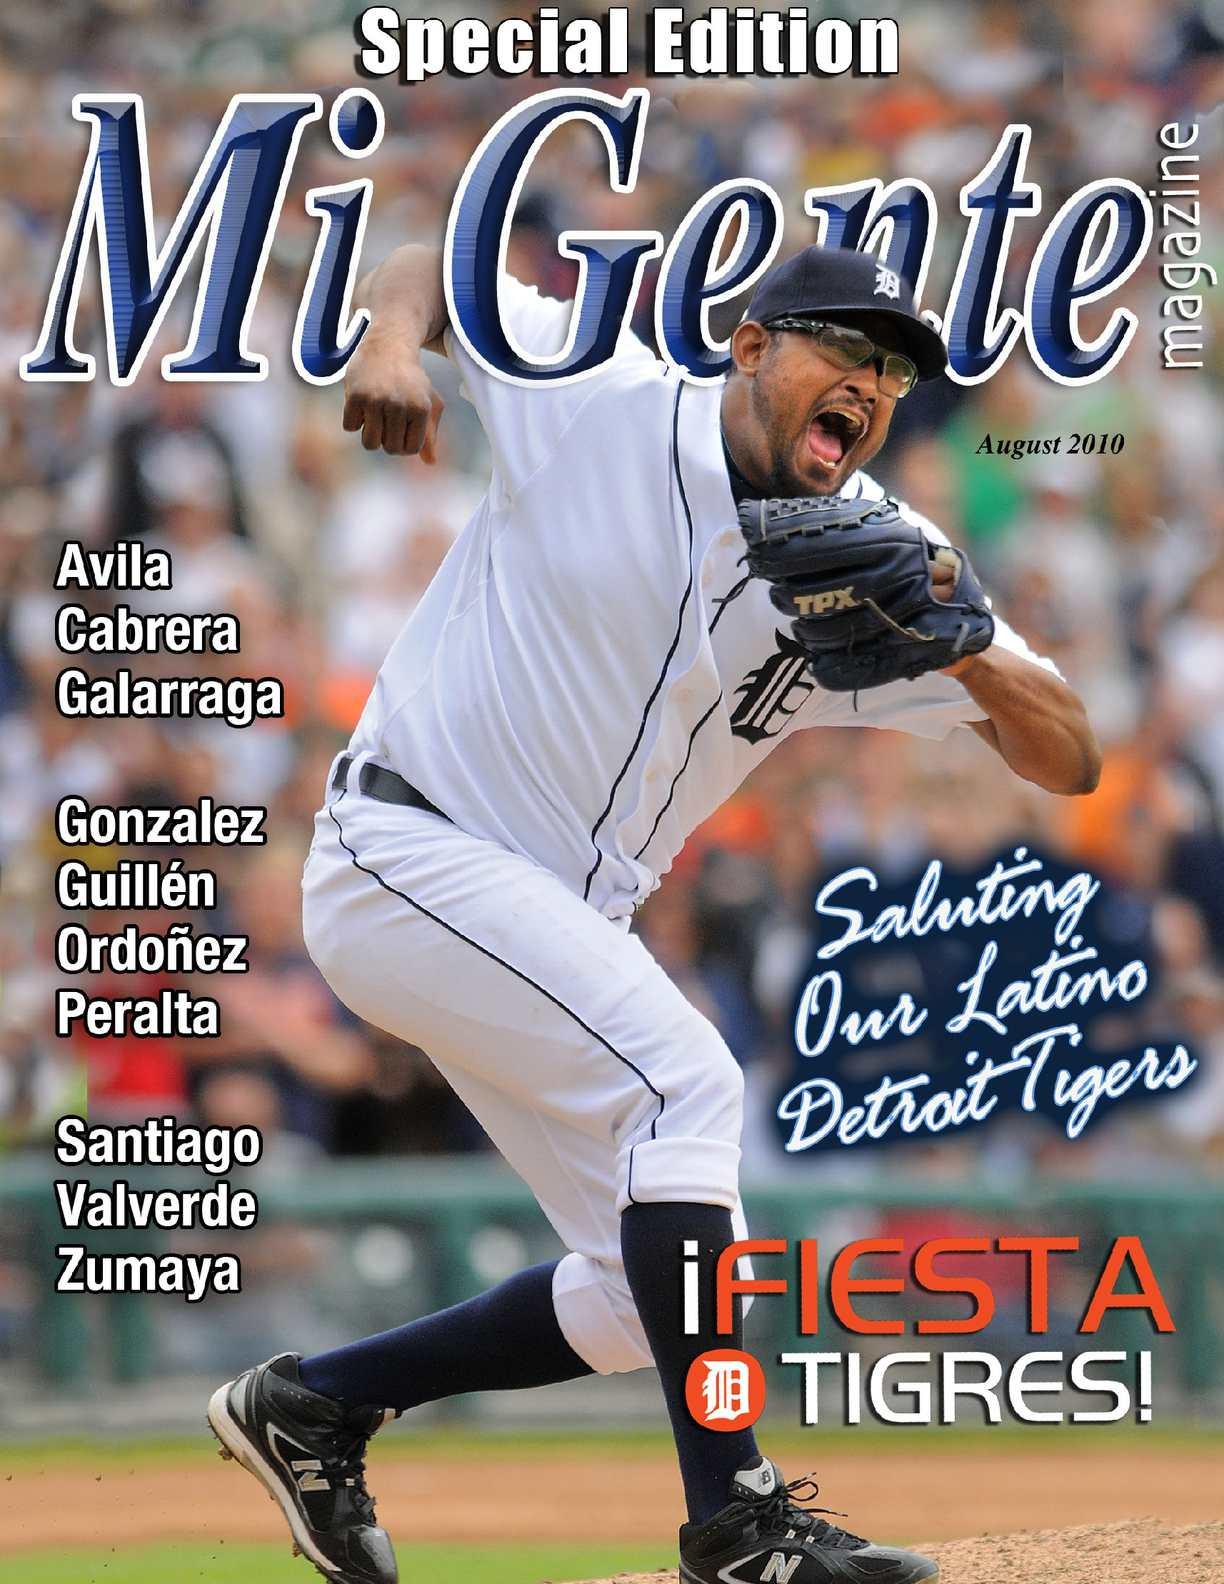 Calaméo - ¡Fiesta Tigres! Detroit Tiger Issue 2010 9897cfa7a26